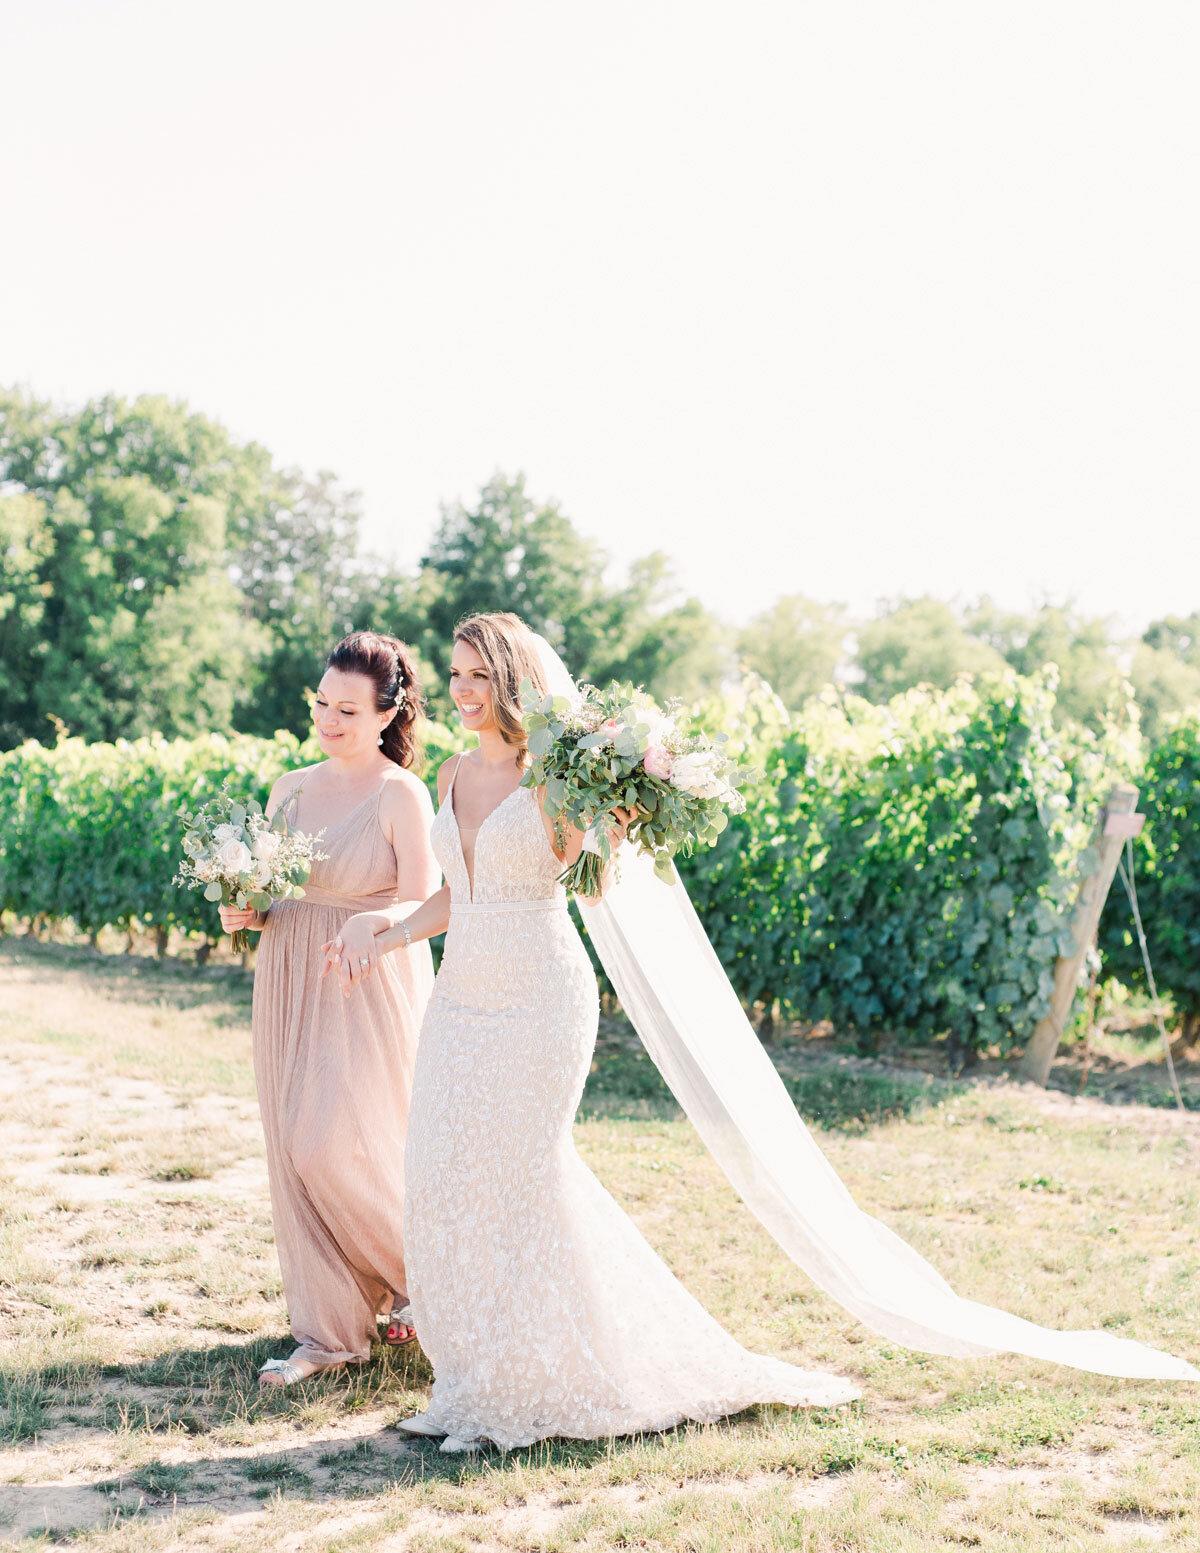 Chateau-des-Charmes-Wedding-Summer-Vineyard-Bride-Niagara-on-the-Lake-photos-by-Gemini-Photography-Ontario-0038.jpg